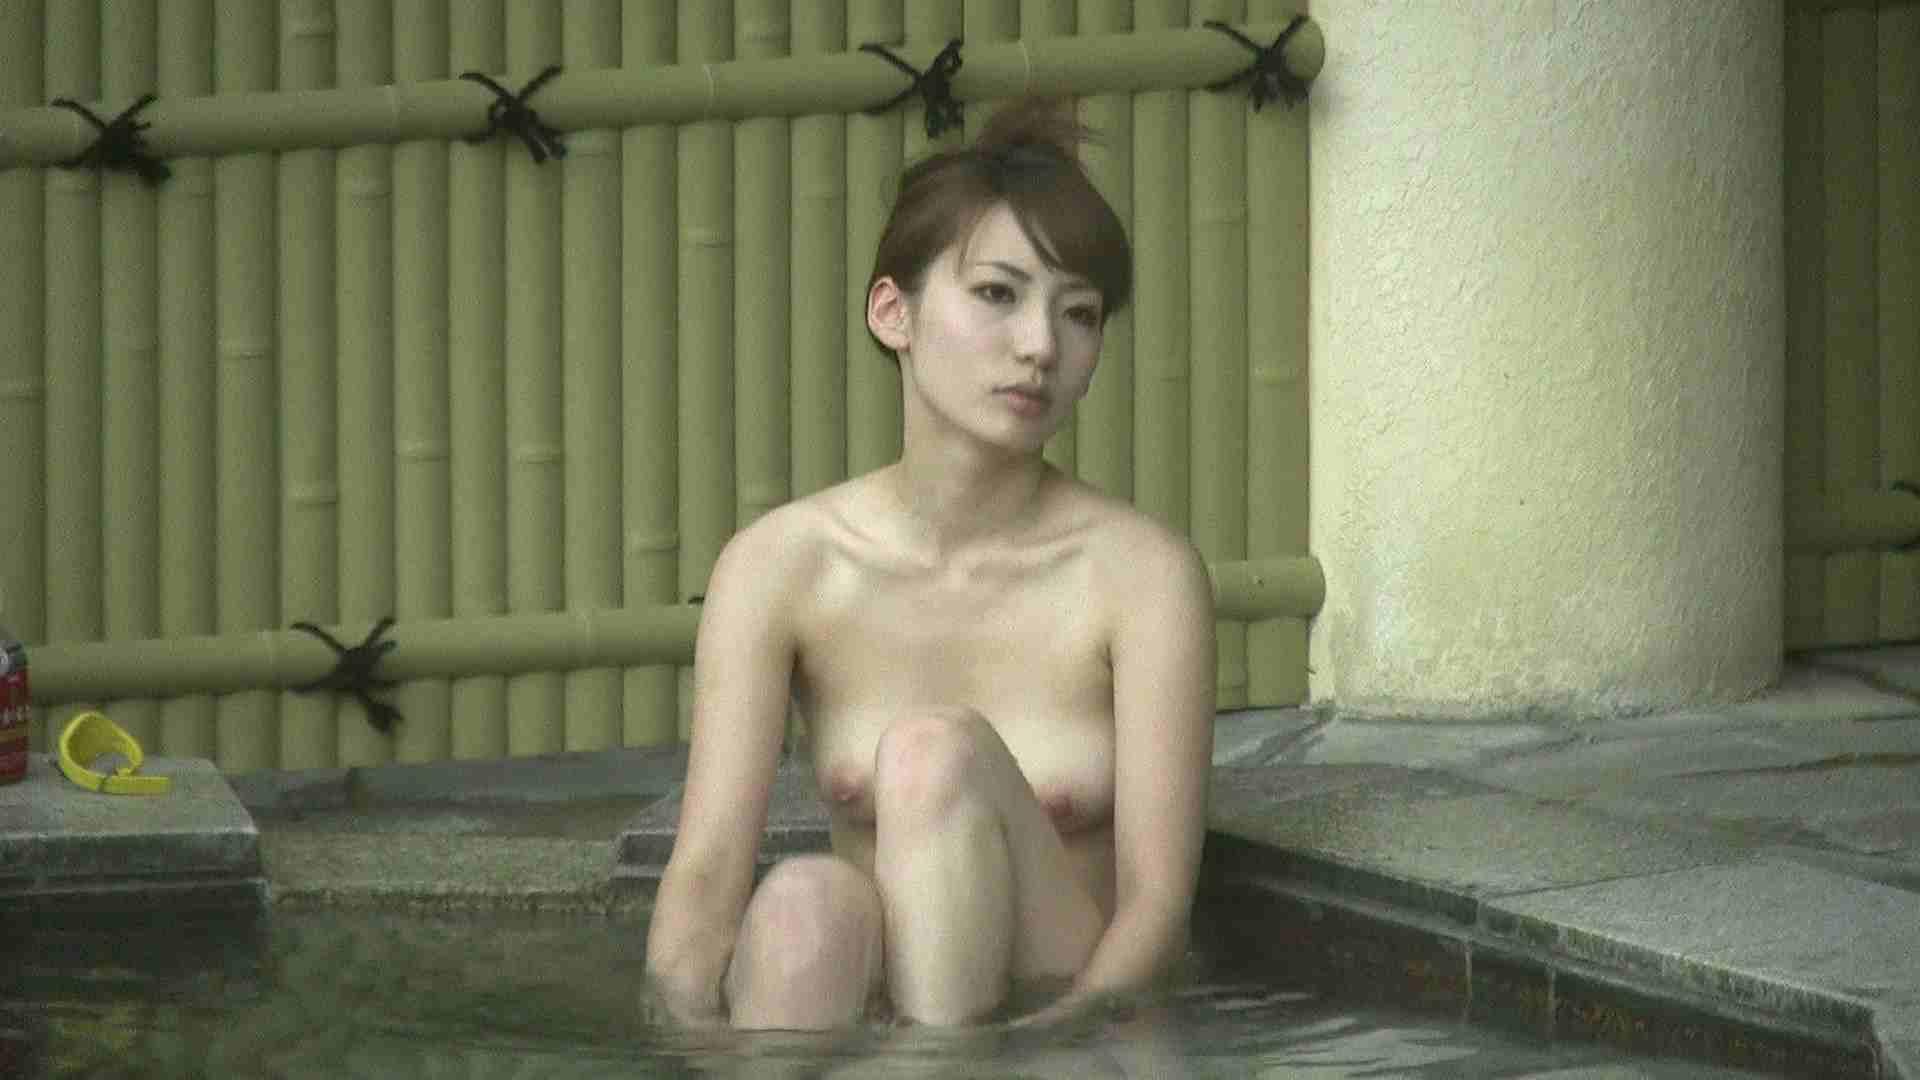 Aquaな露天風呂Vol.208 盗撮 隠し撮りオマンコ動画紹介 85画像 41